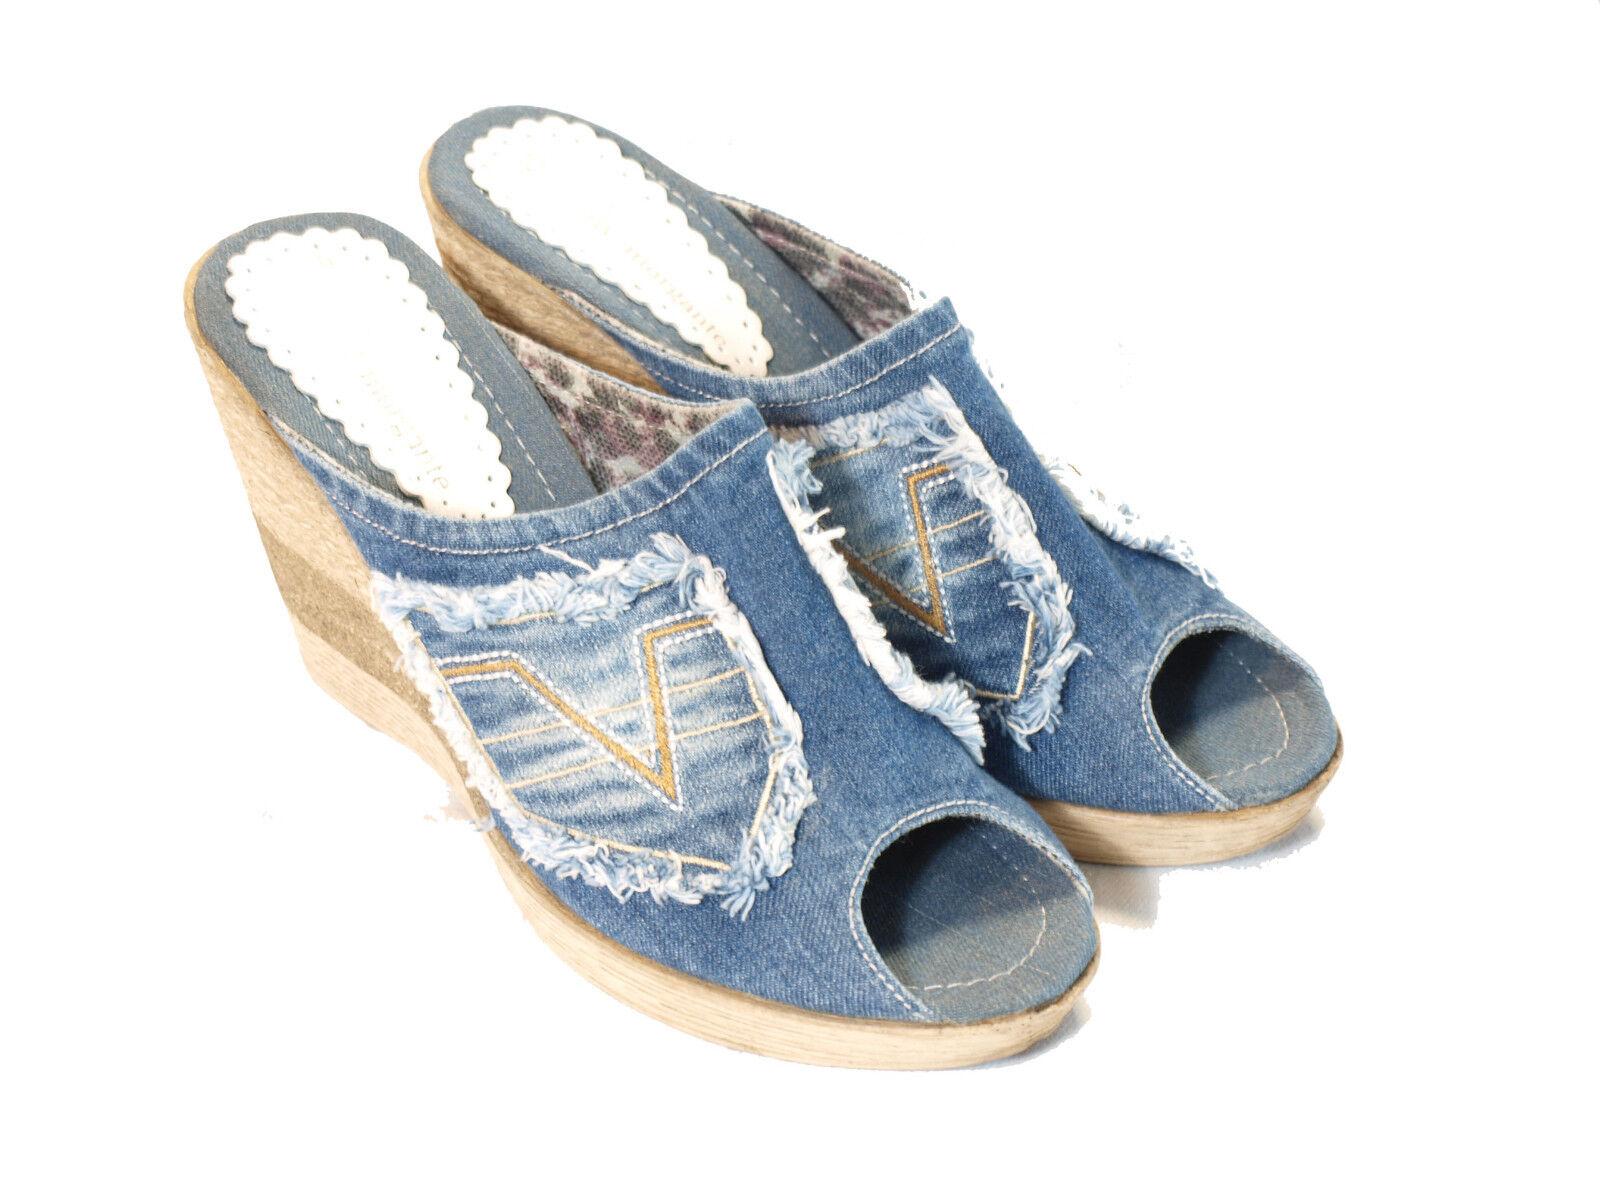 Sandalia, high-Denim/ligeramente/mm13104 jeans sandalia con tacón de cuña (10 cm) high-Denim/ligeramente/mm13104 Sandalia, 325e96